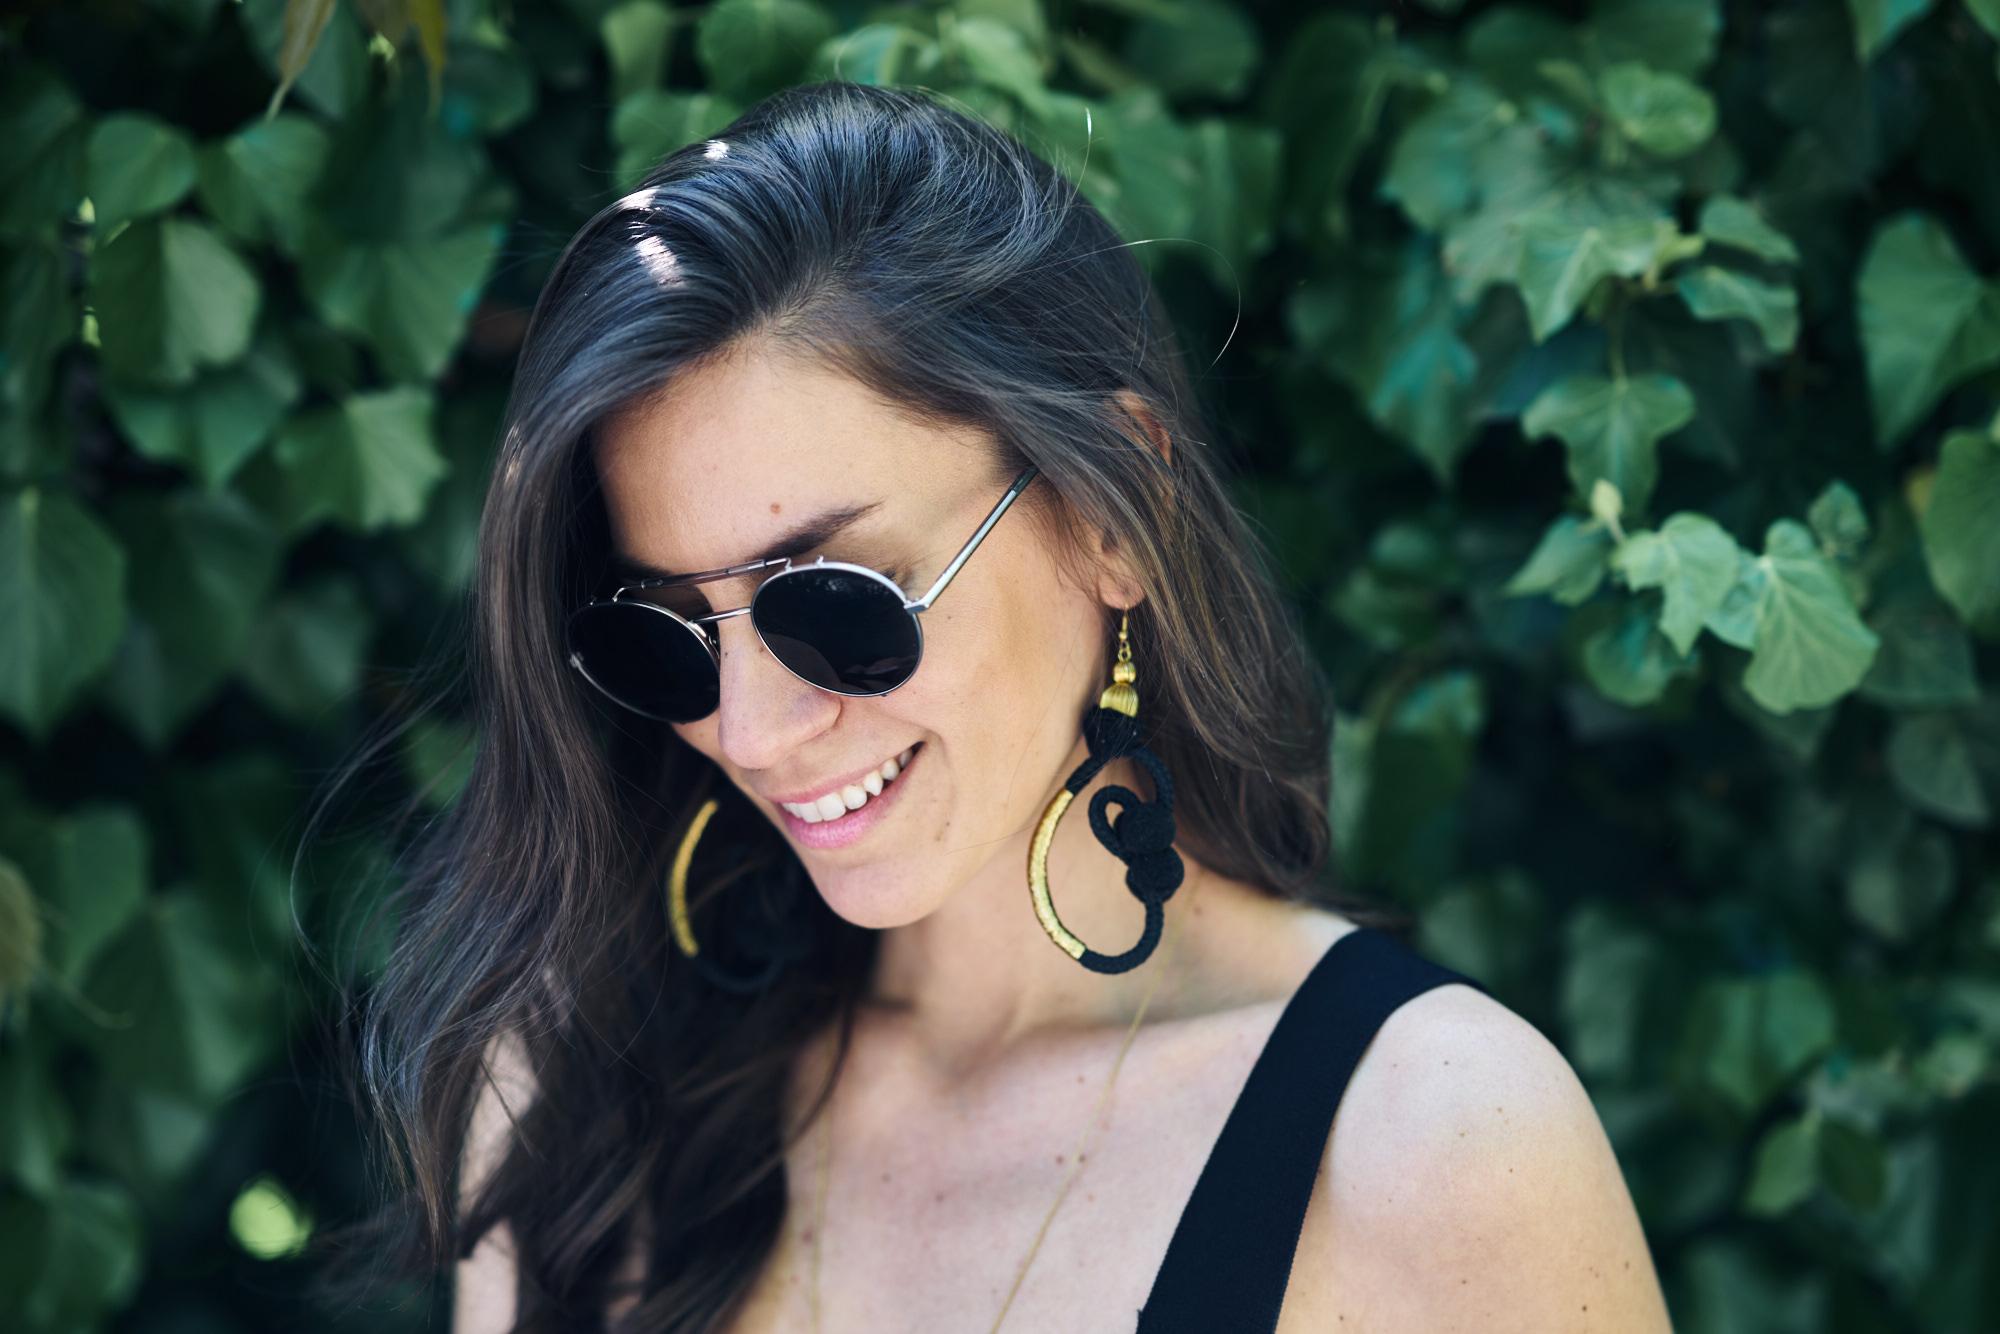 billur saatci, offnegiysem, street style, turkish style blogger, nike women, nike, etty&jacques, miu miu,  Proenza Schouler, opening ceremony, two continents,